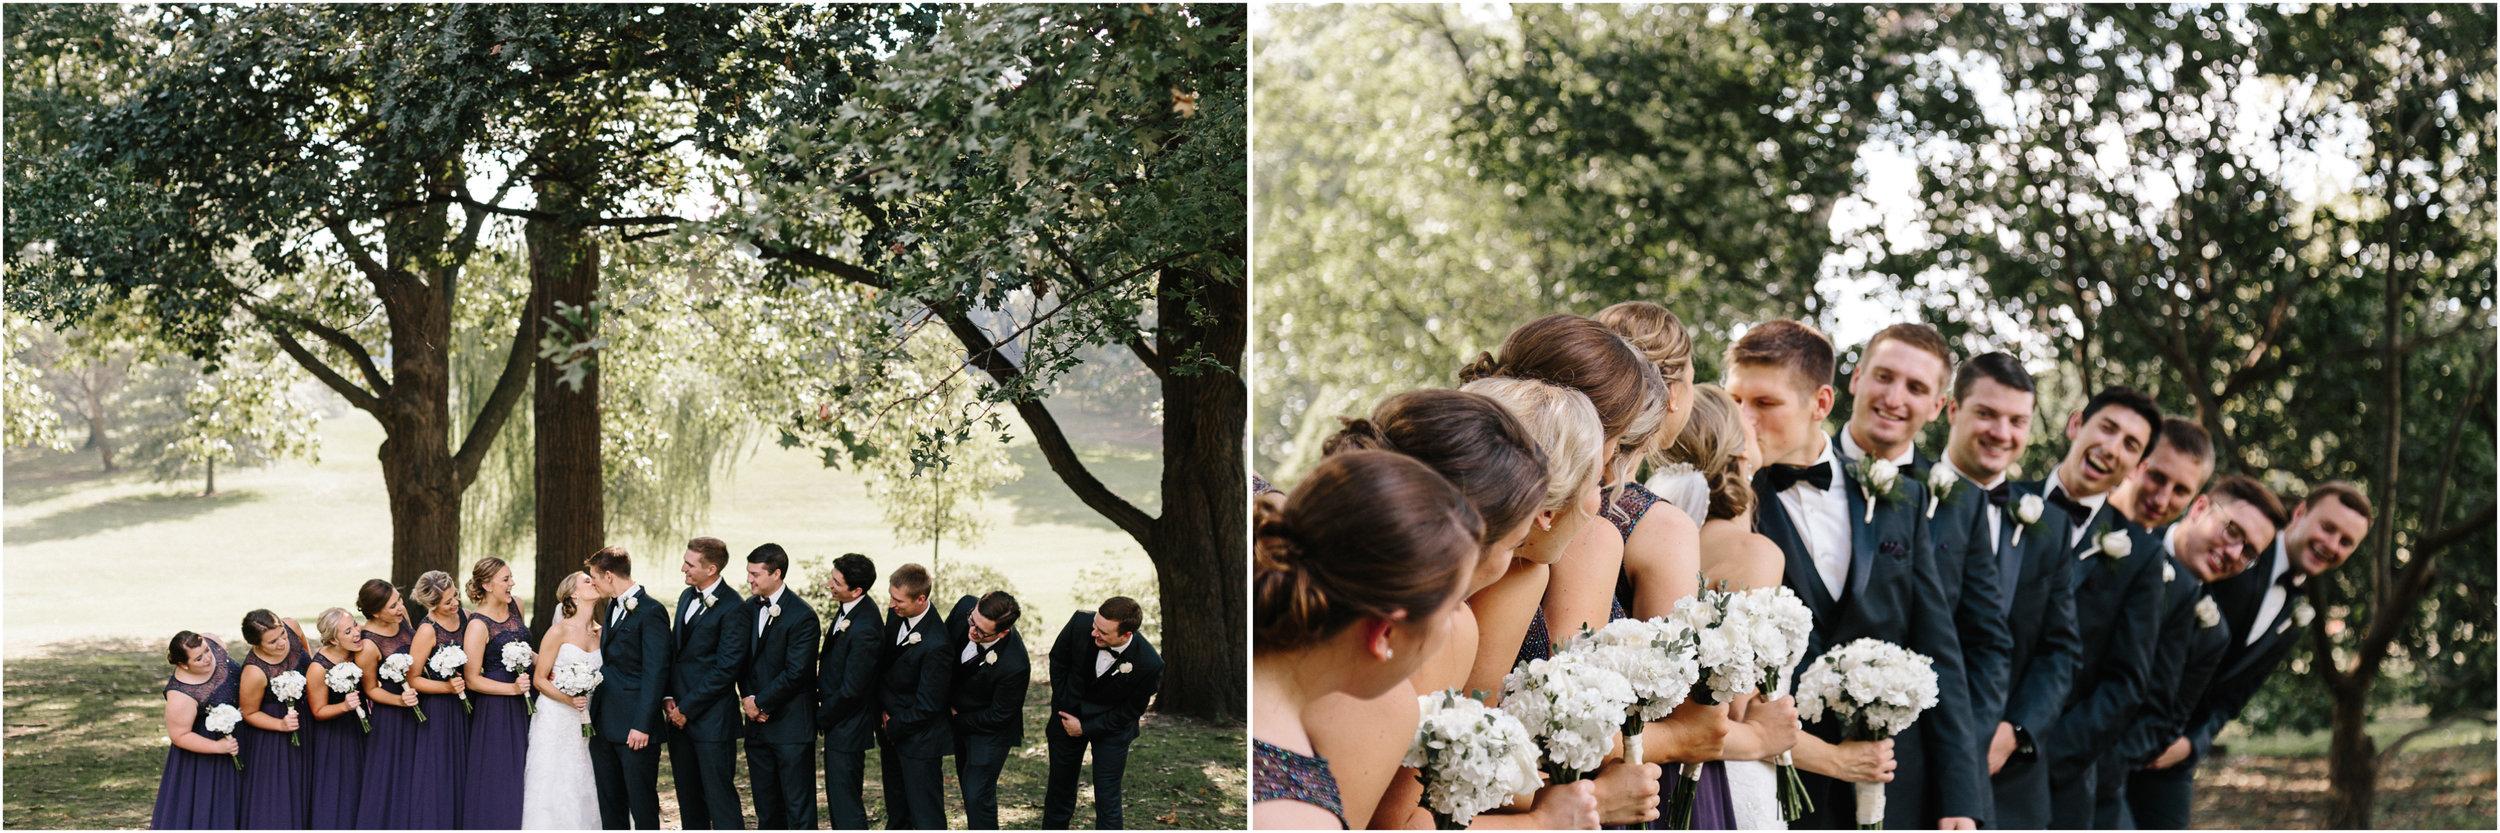 alyssa barletter photography kansas city wedding photographer katie and kendall-29.jpg